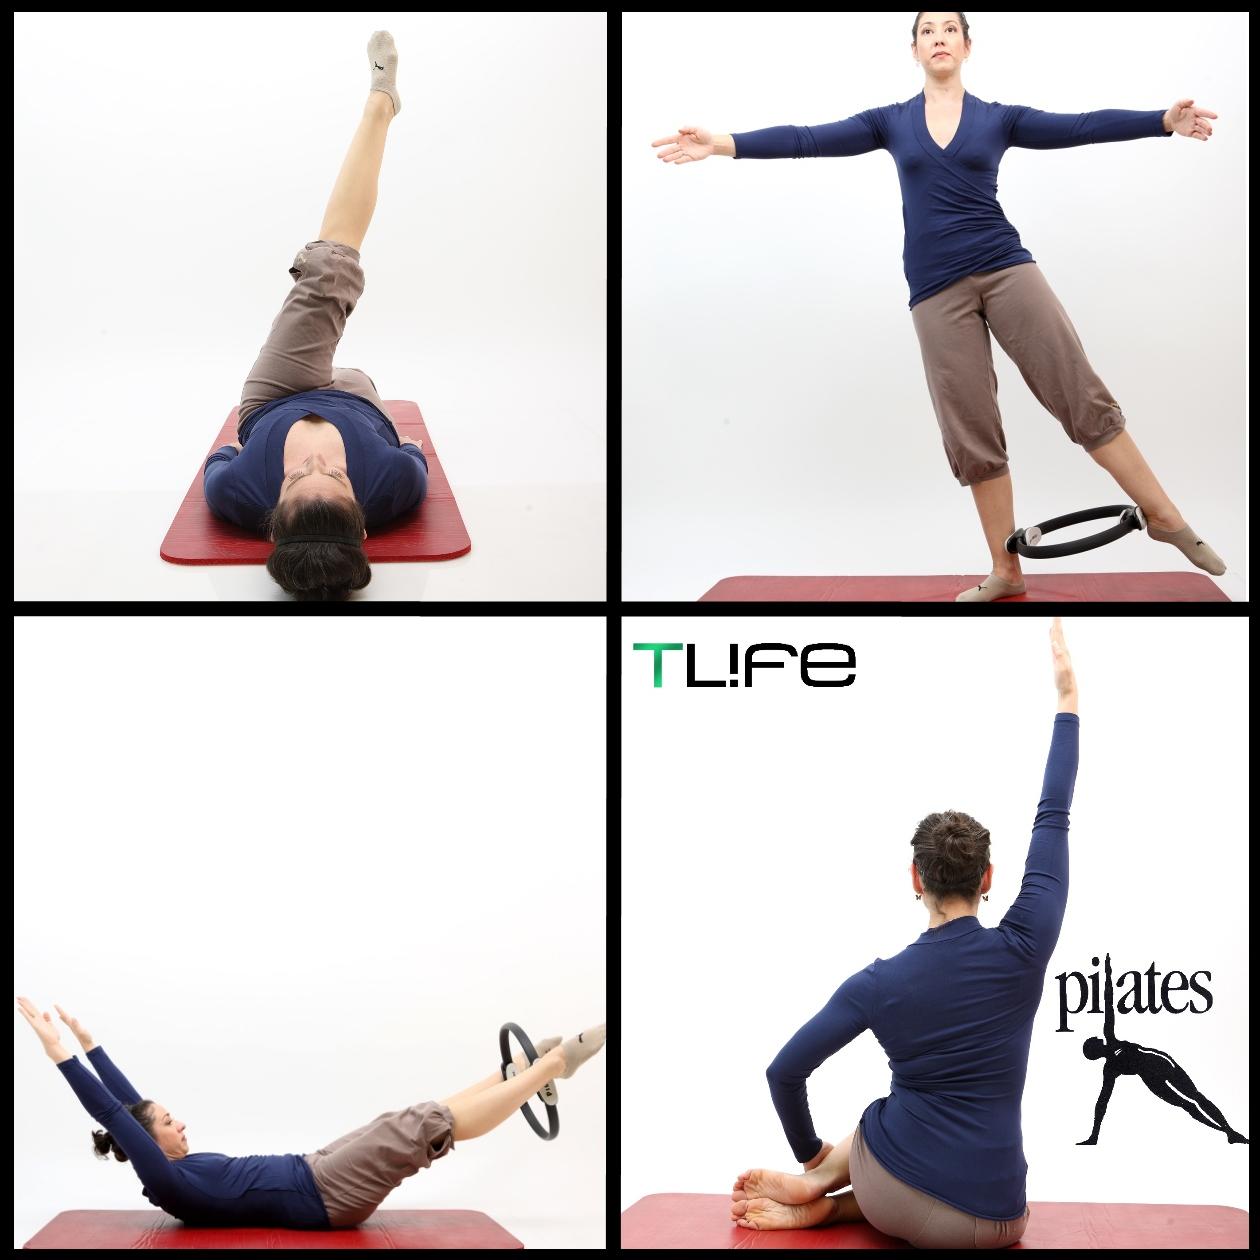 9 | Pilates